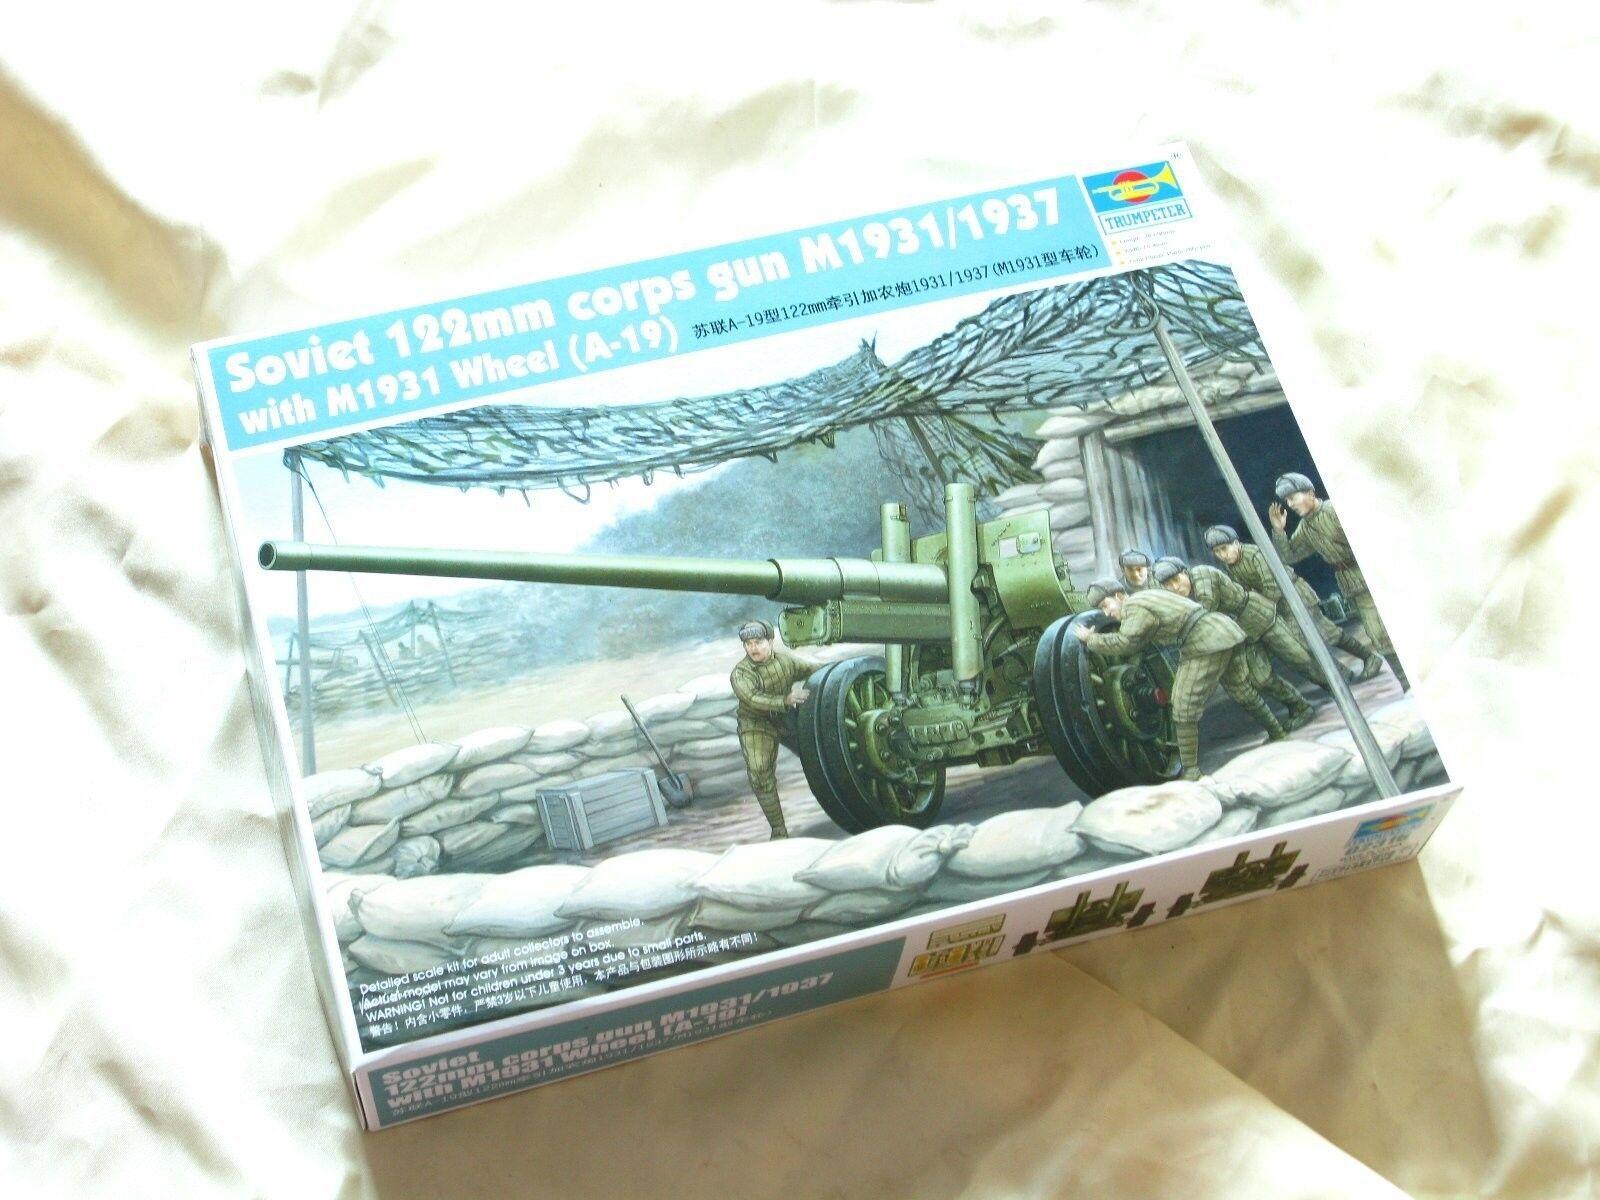 02316 Trumpeter Soviet A-19 122mm Corps Gun M1931 Wheel 1 35 Model Kit